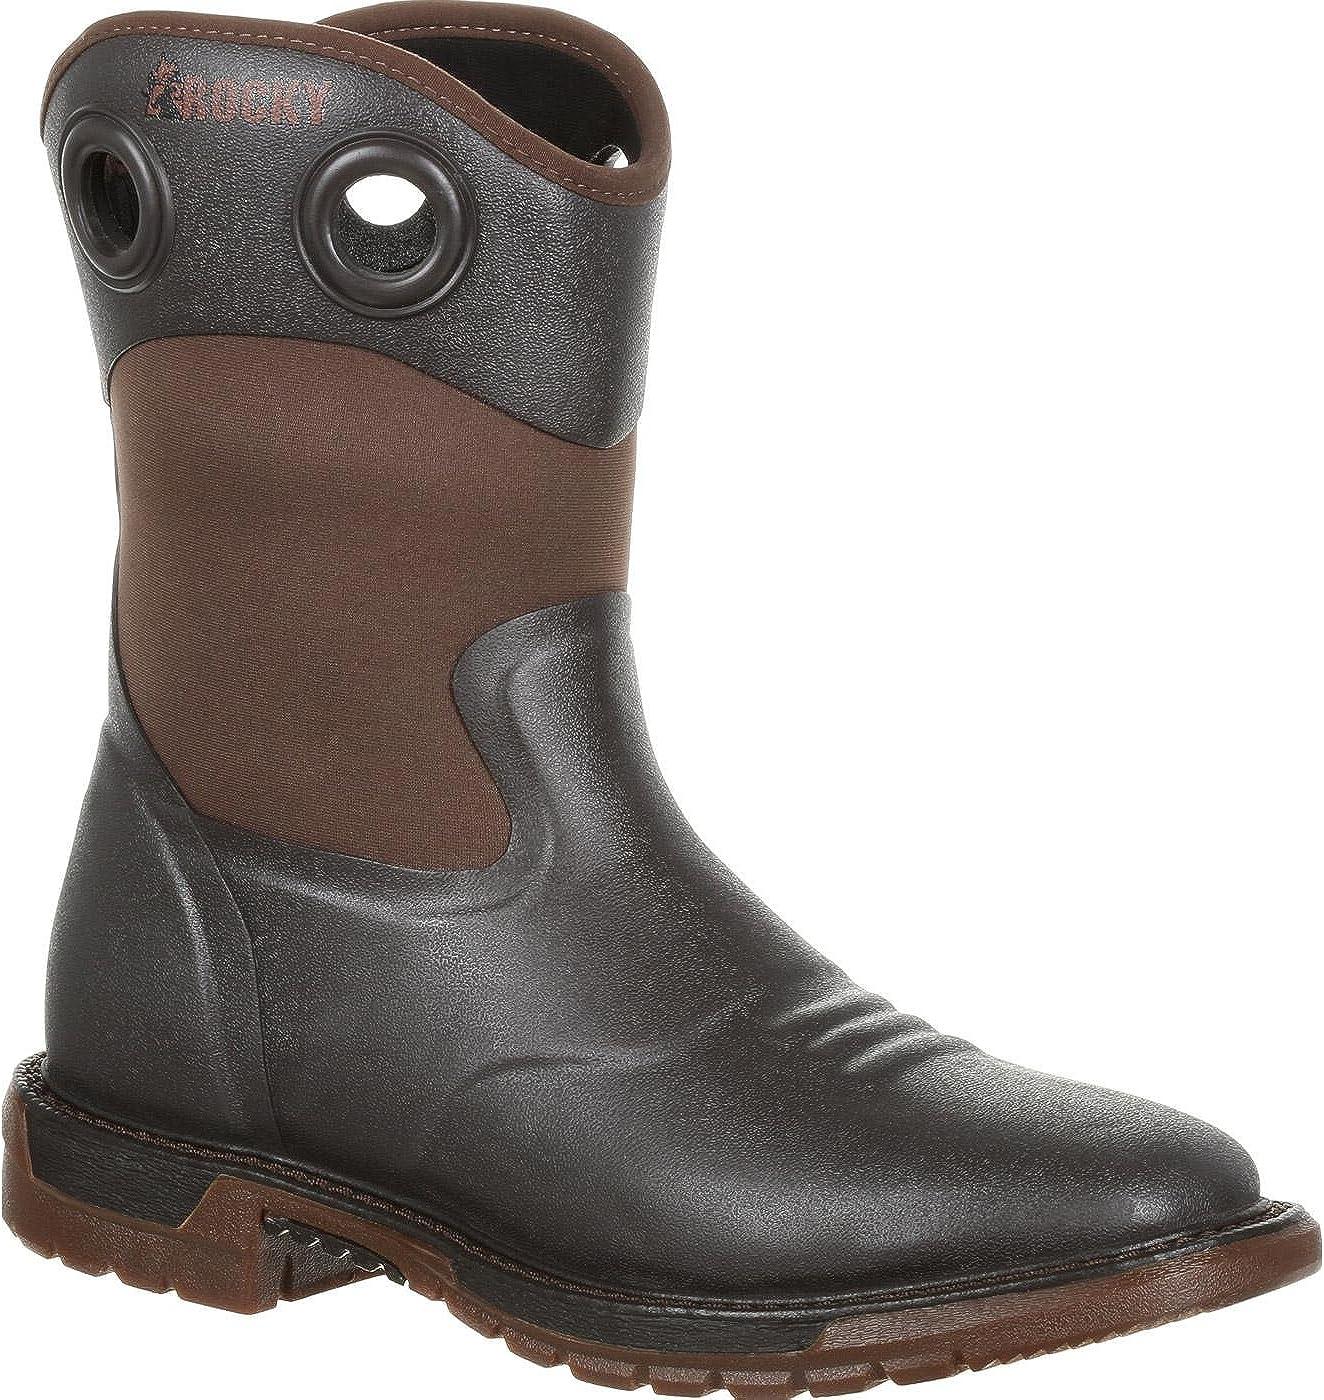 Rocky Original Ride FLX Rubber Boot